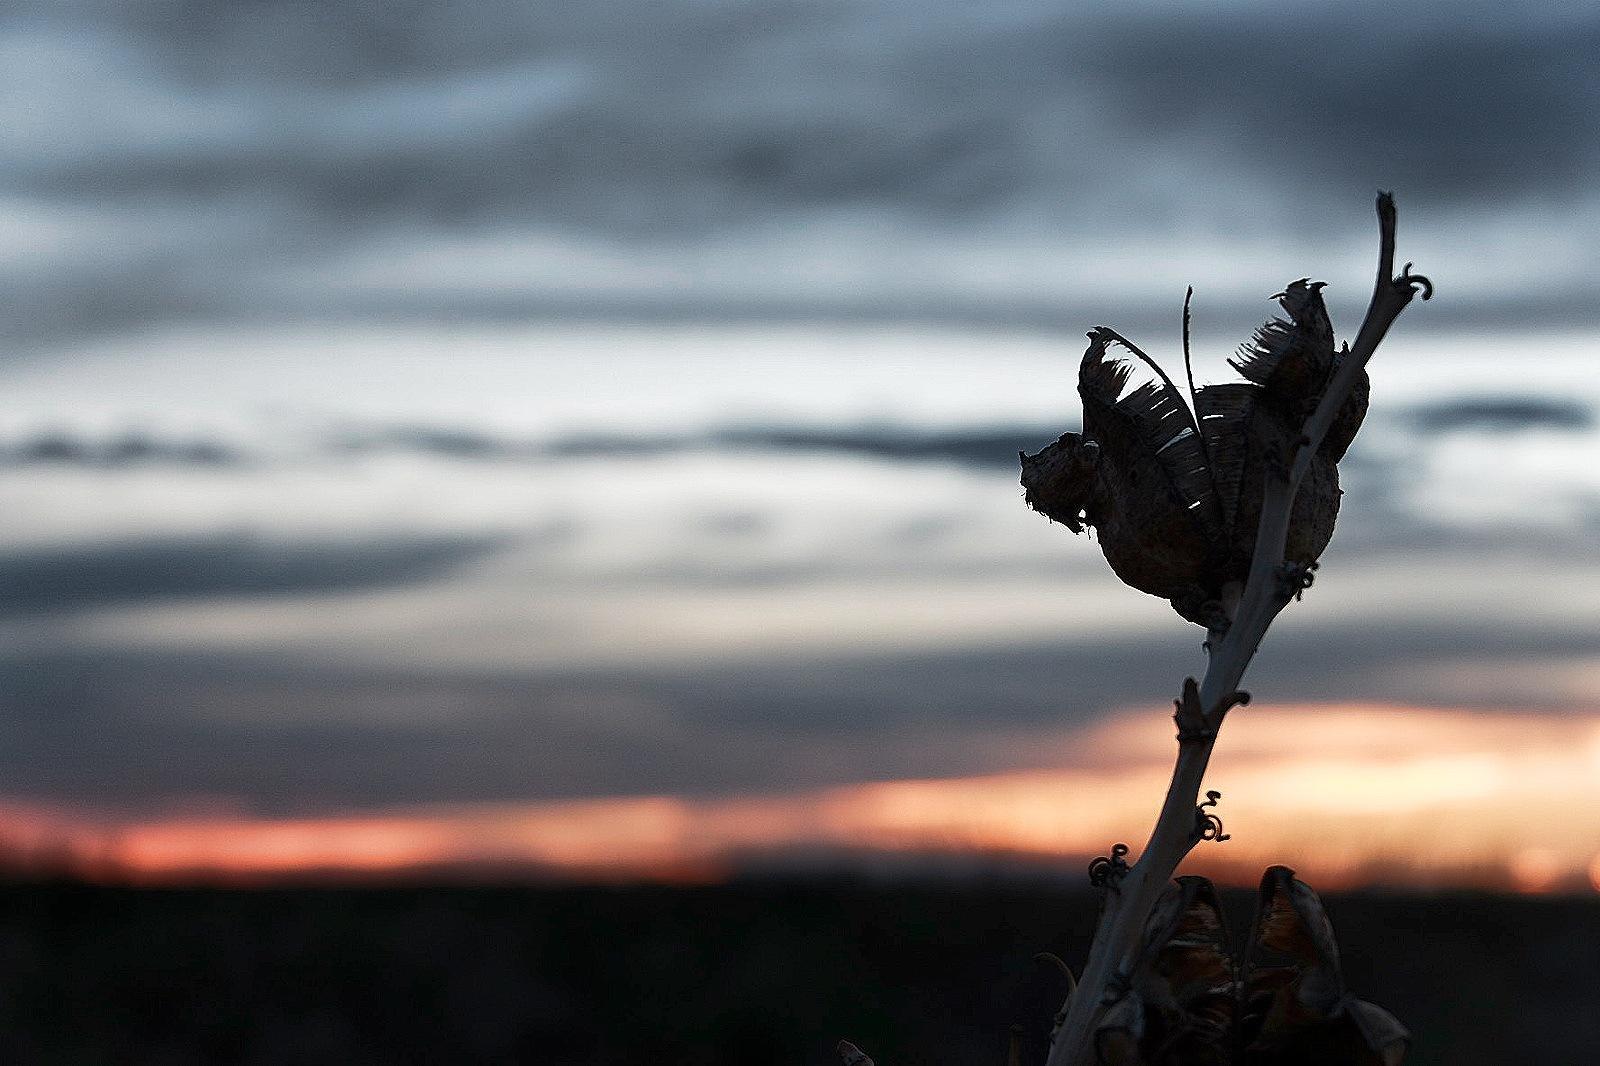 soft sky by Bryan Inostroza